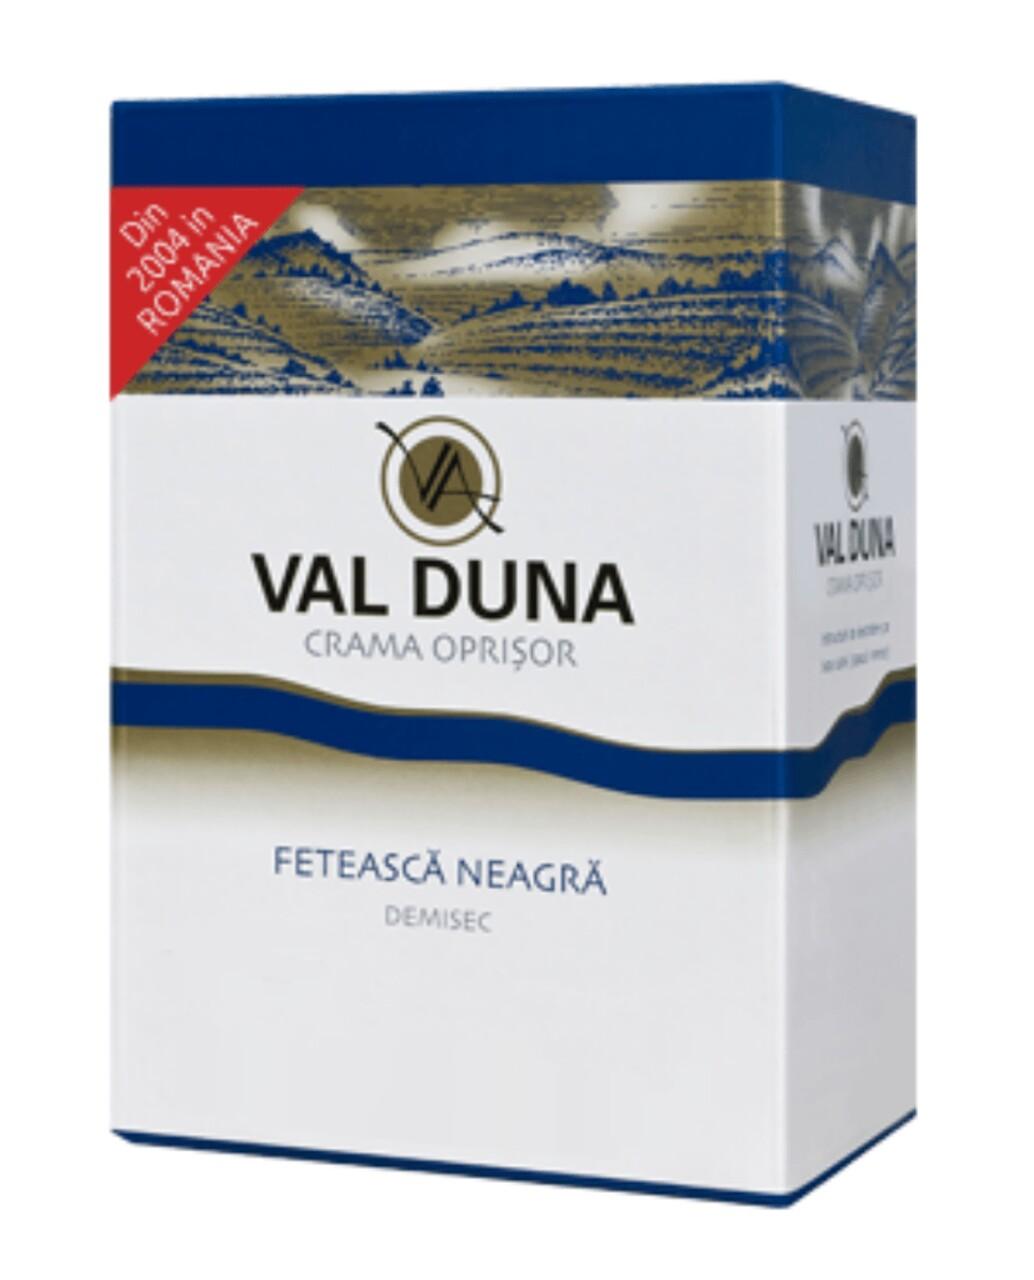 Oprisor Val Duna Feteasca Neagra BIB 5L